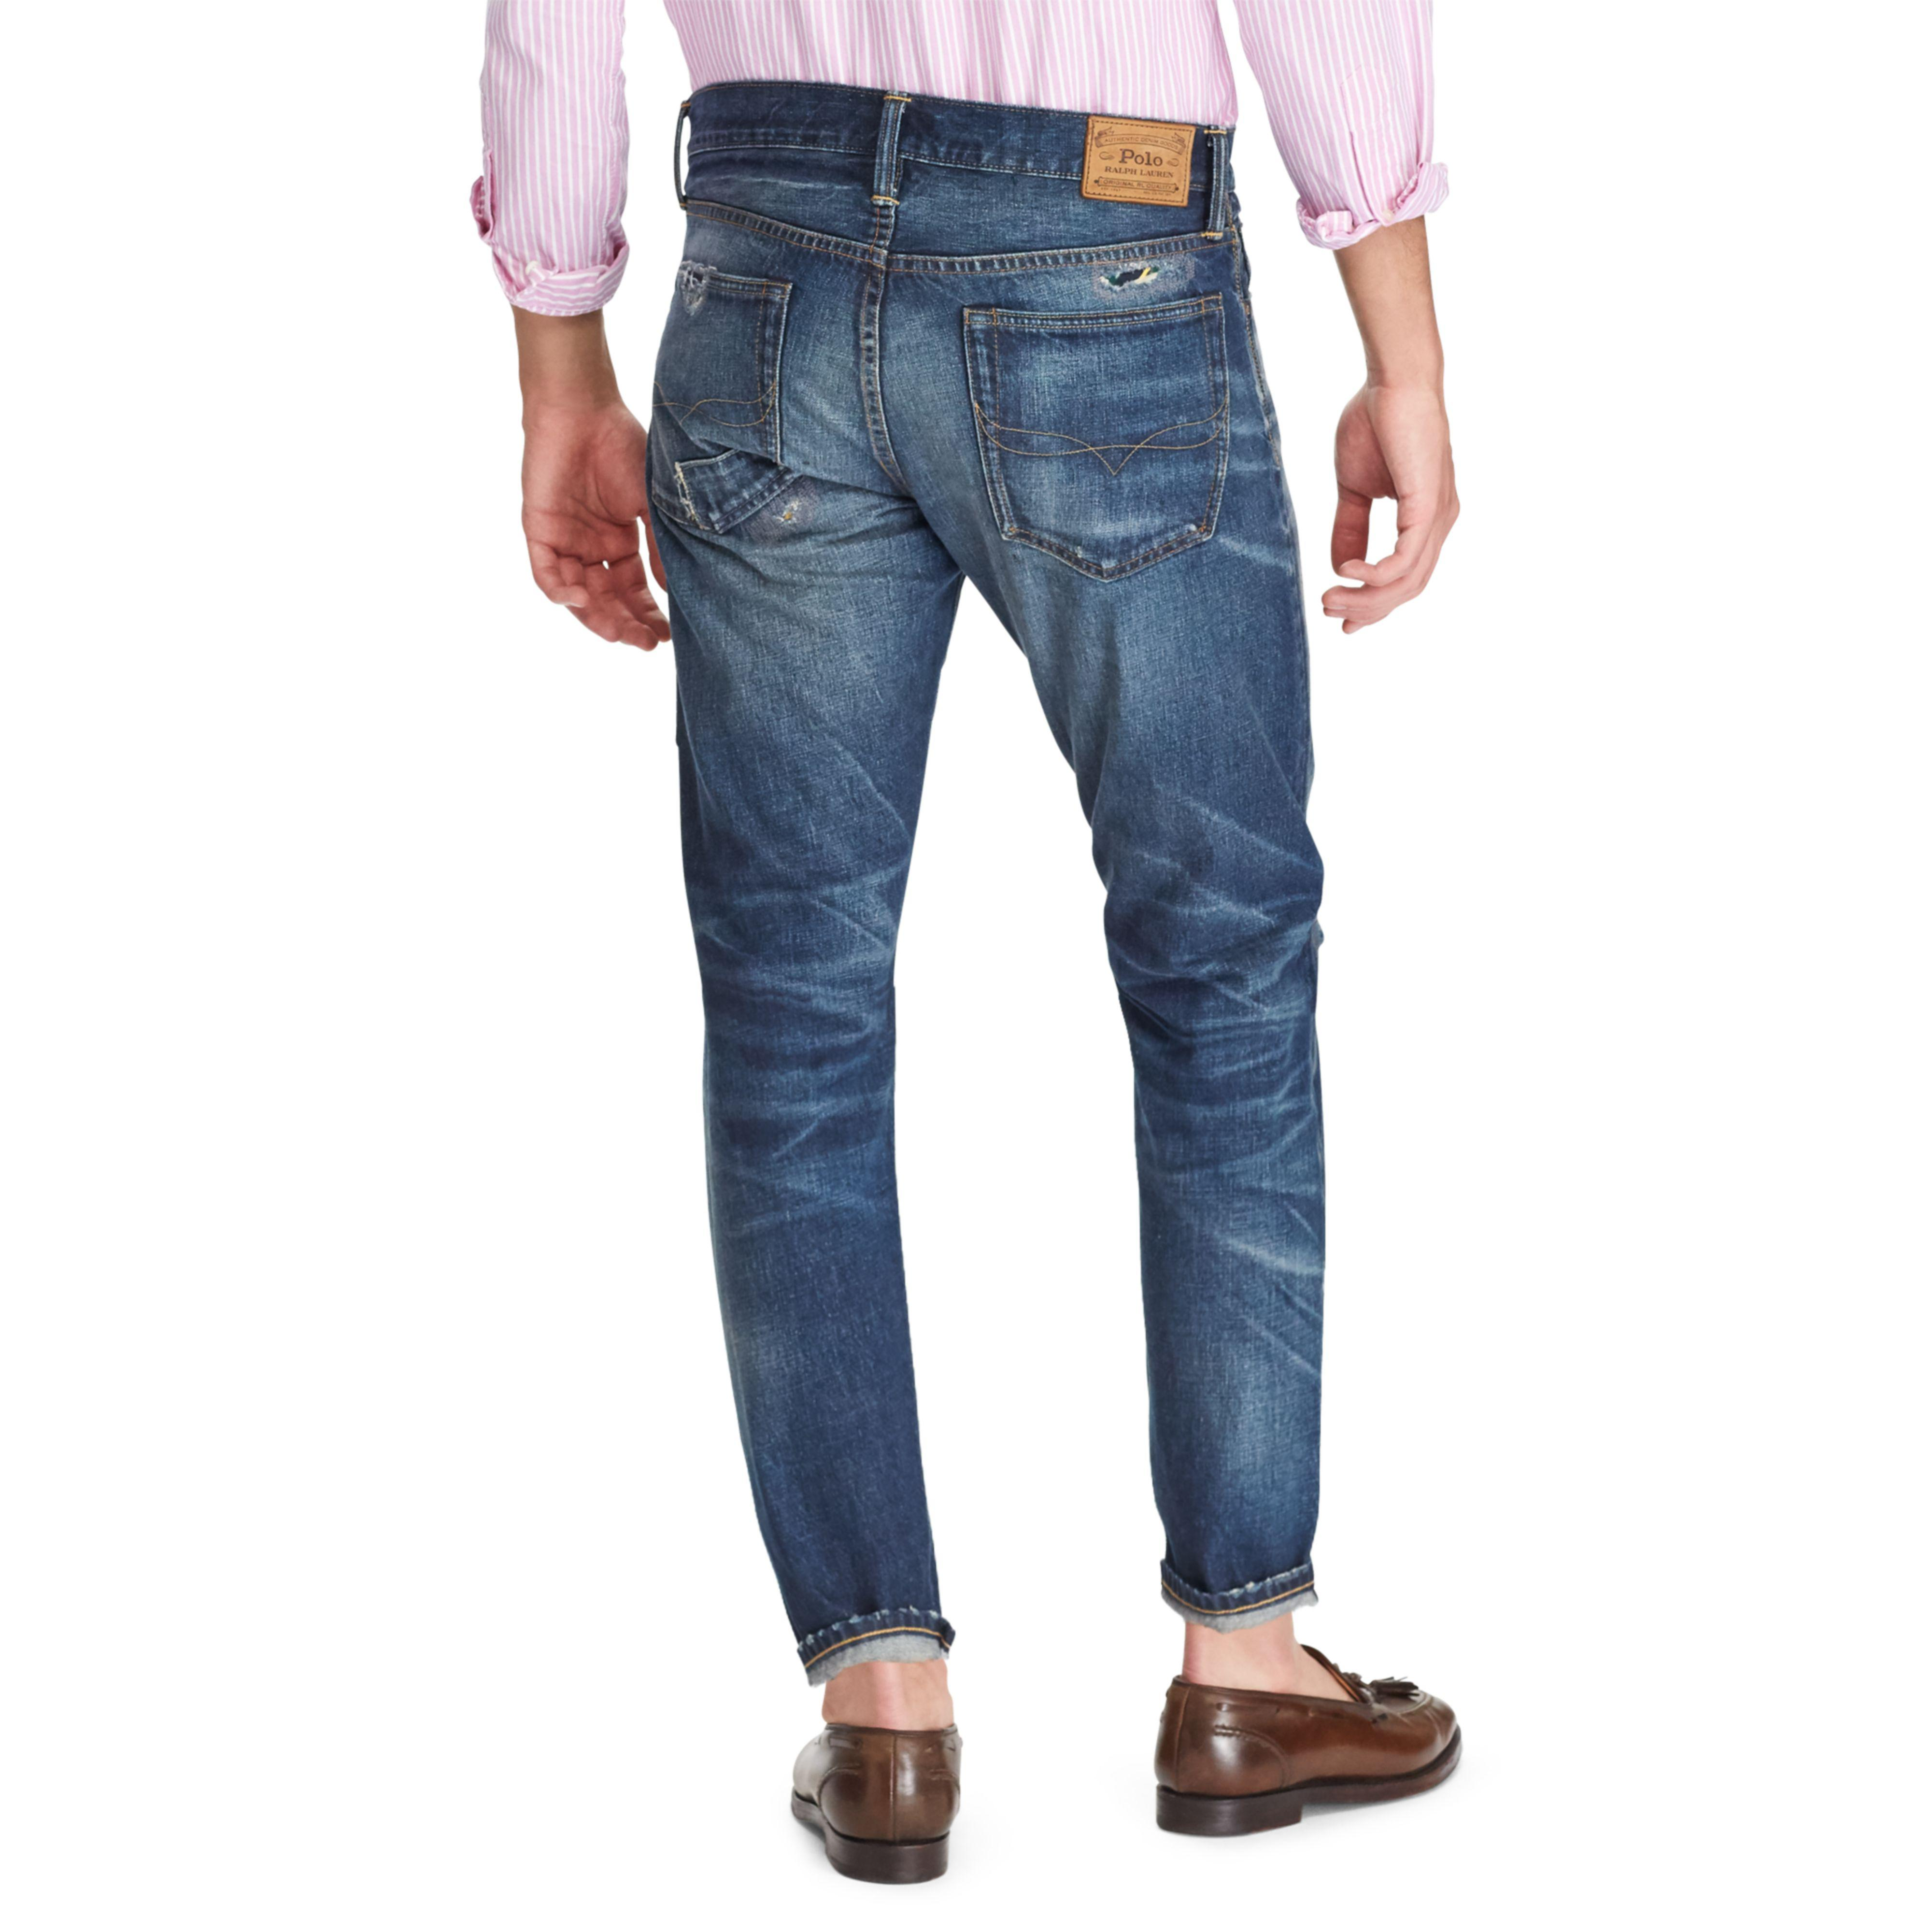 8bd1b2e15 Polo Ralph Lauren Sullivan Slim Cropped Jean in Blue for Men - Lyst